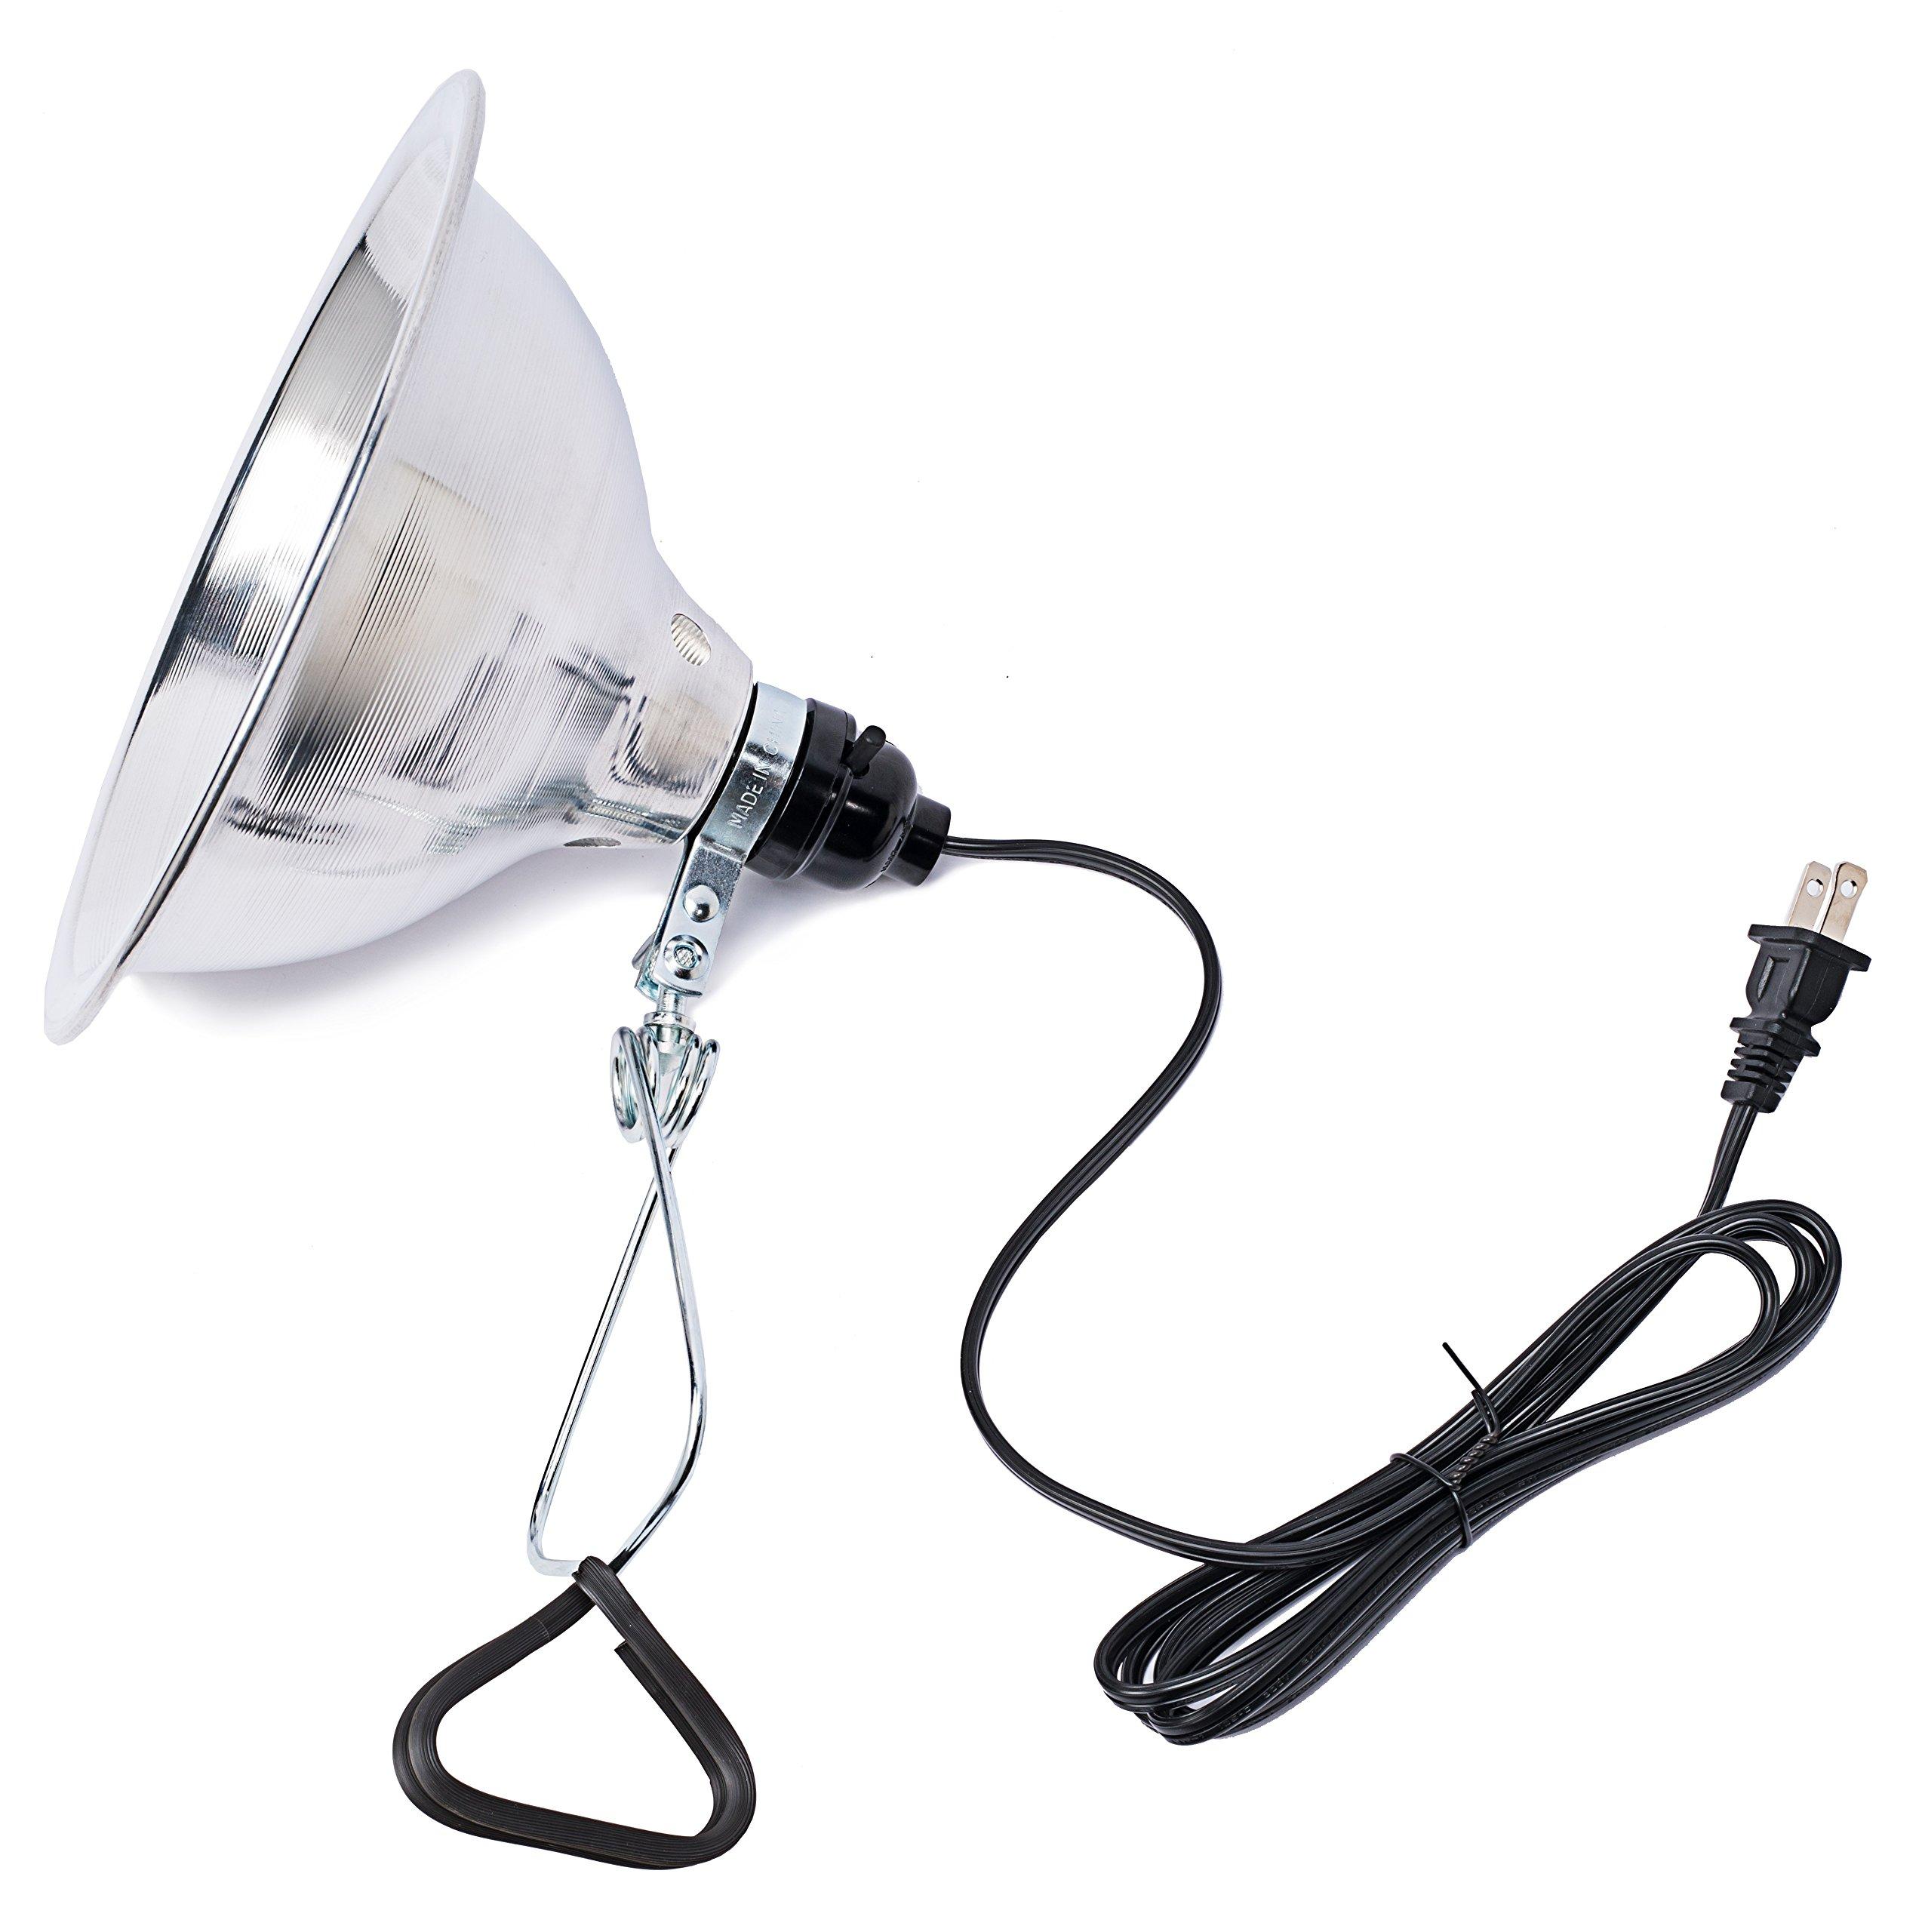 Clamp Lamp Light Clip Light Bed Lamp, w/ 8.5-Inch Reflector, 150-Watt, 18/2 SPT 6 Feet Cord, UL Listed by The Dawson Bros